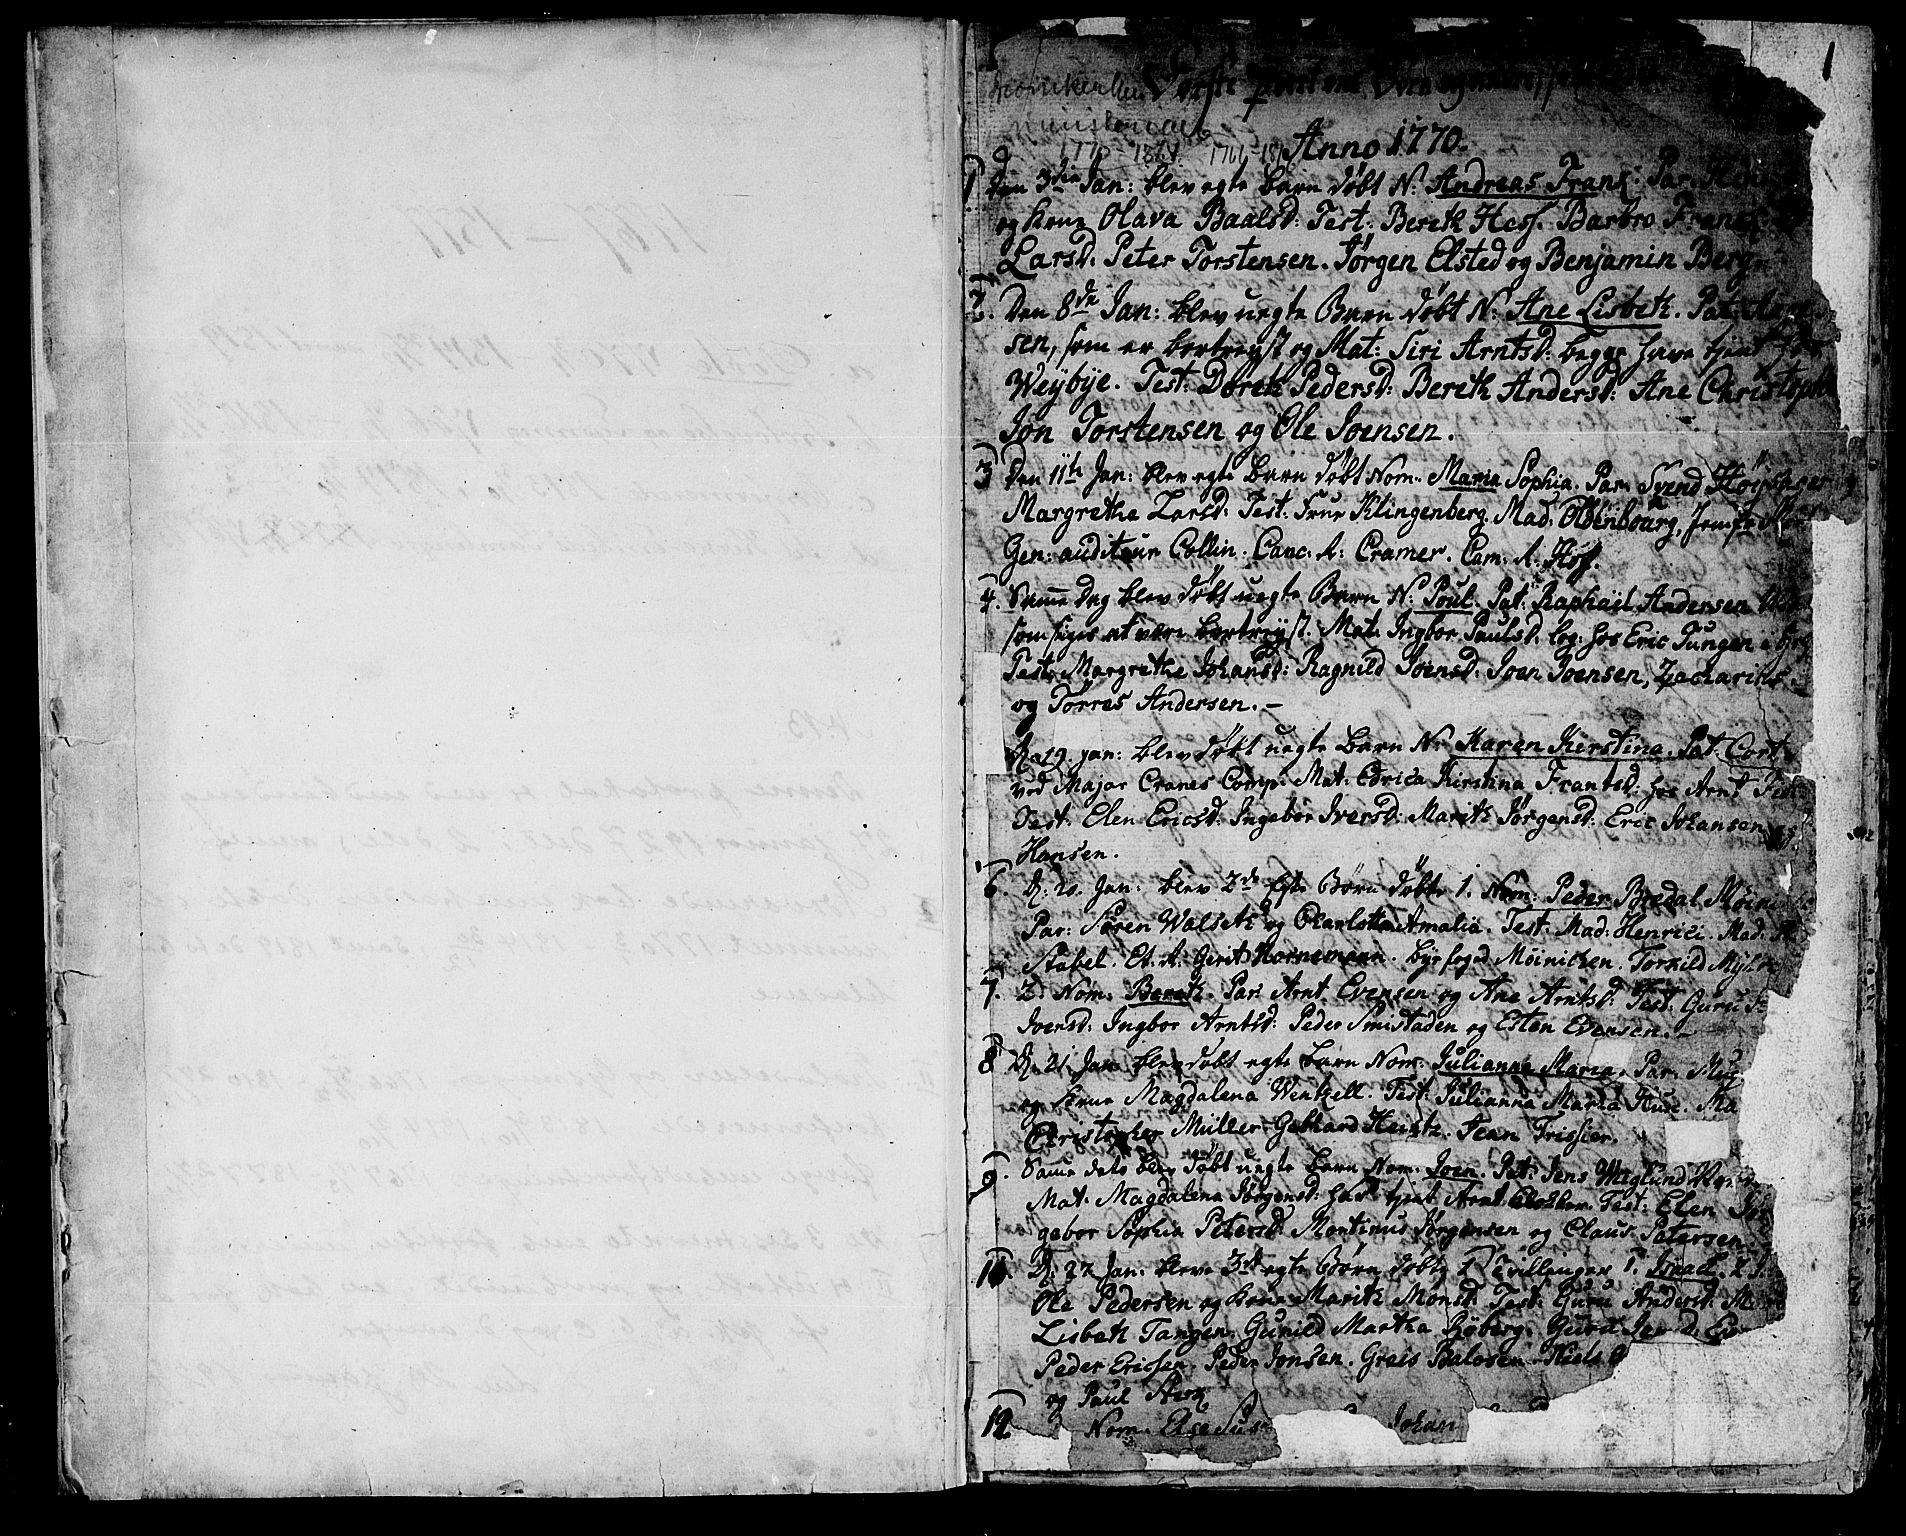 SAT, Ministerialprotokoller, klokkerbøker og fødselsregistre - Sør-Trøndelag, 601/L0039: Parish register (official) no. 601A07, 1770-1819, p. 1